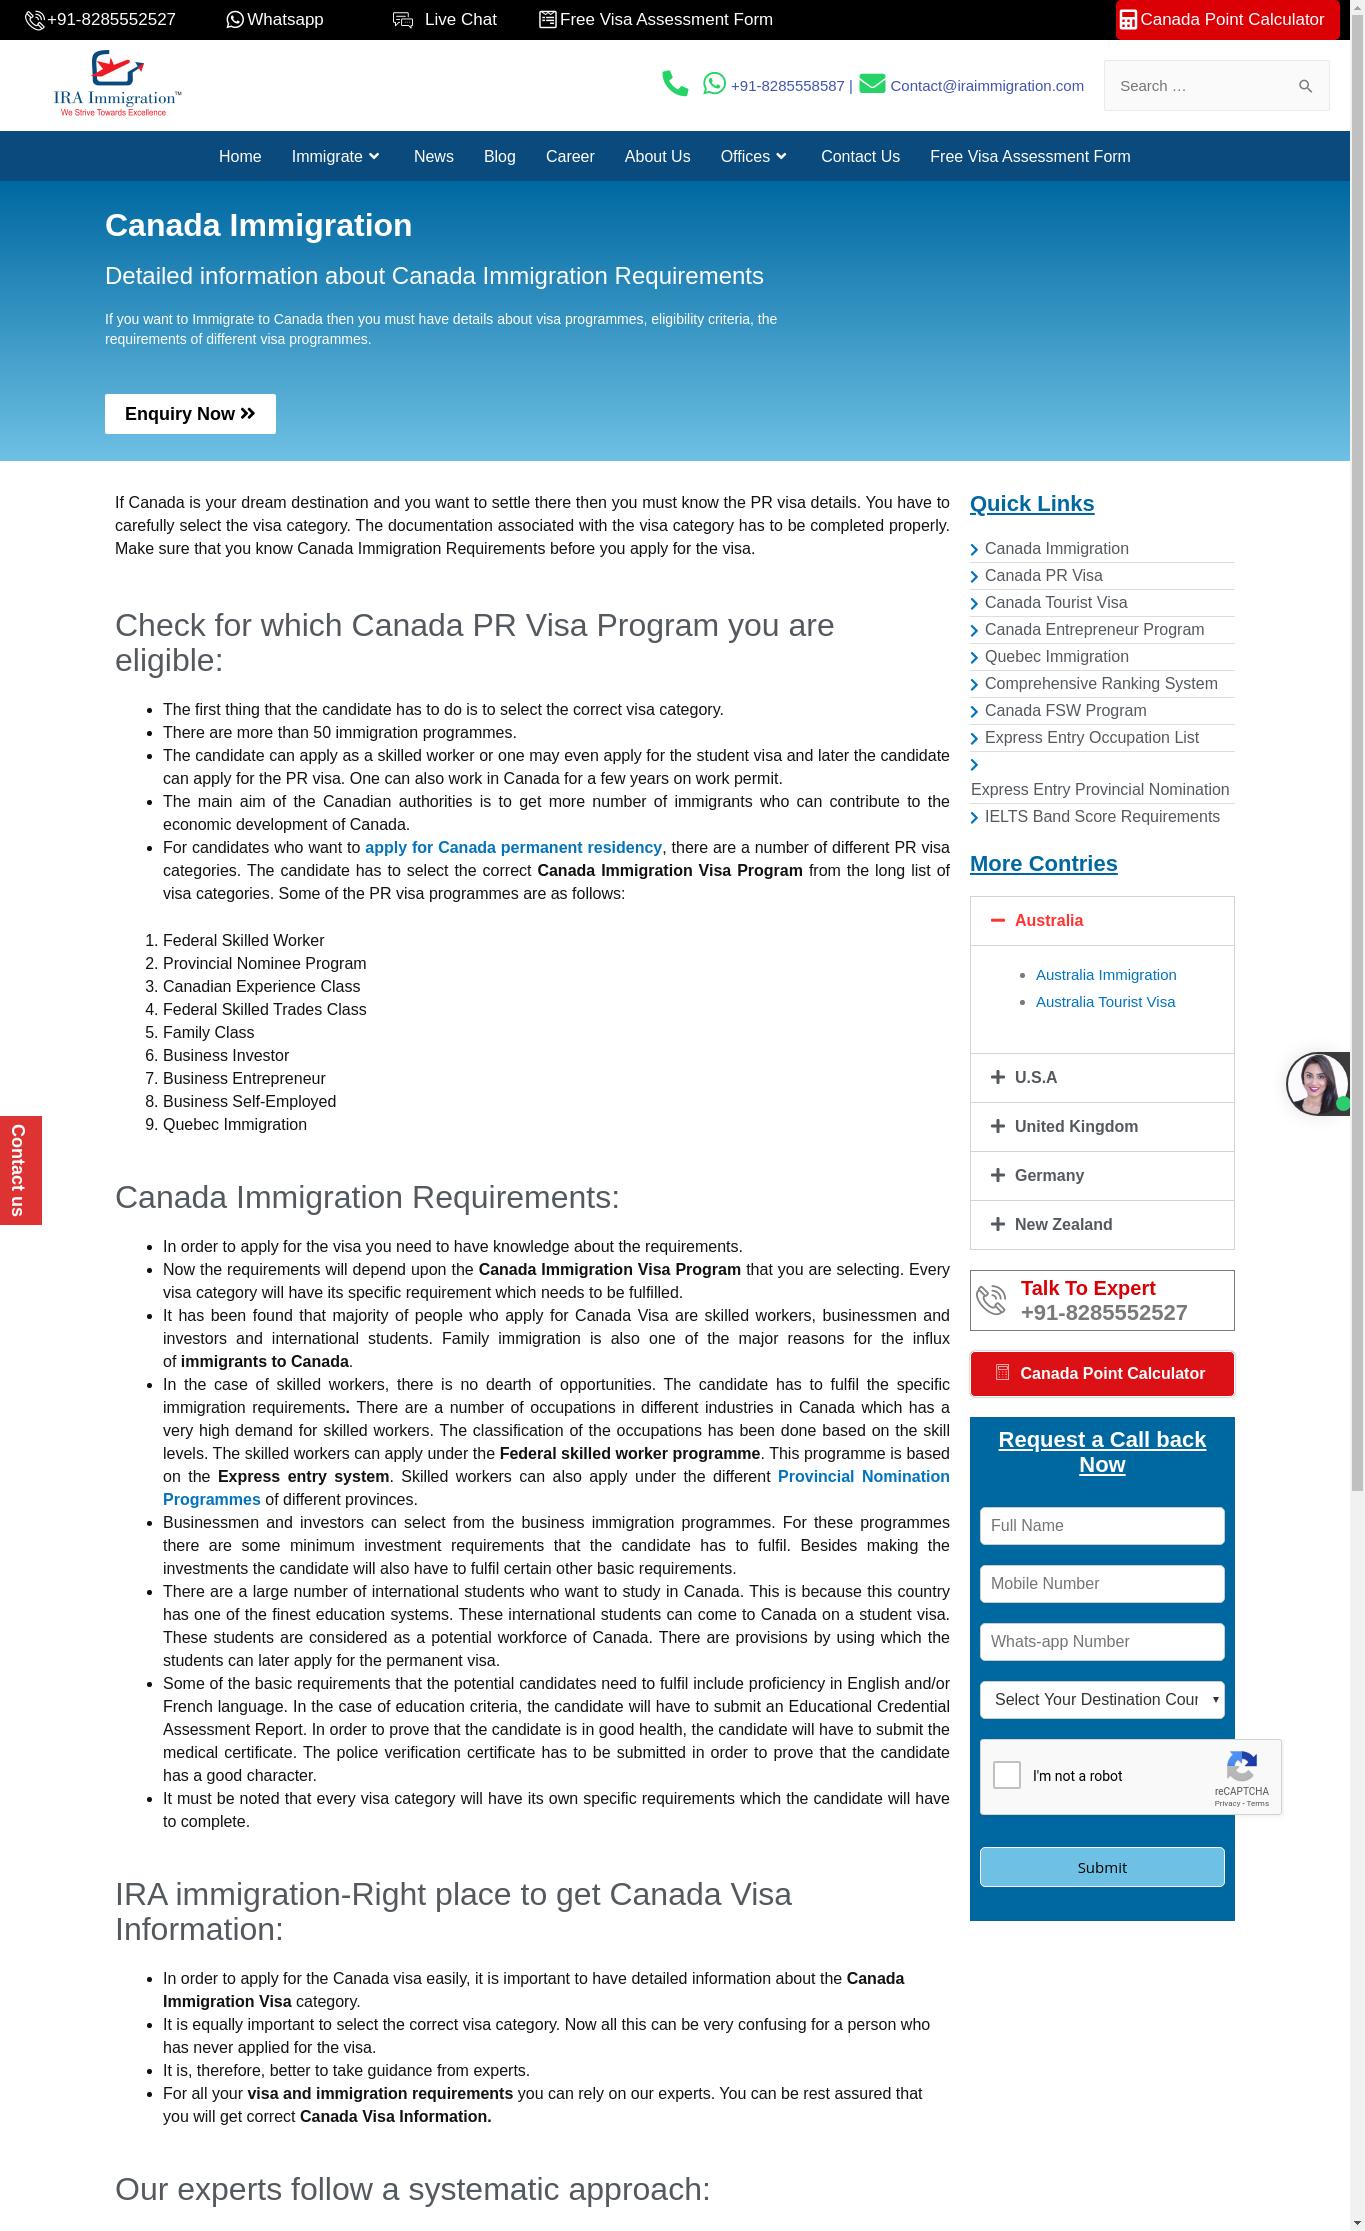 palakyadav · Canada Permanent Resident Visa · Posts